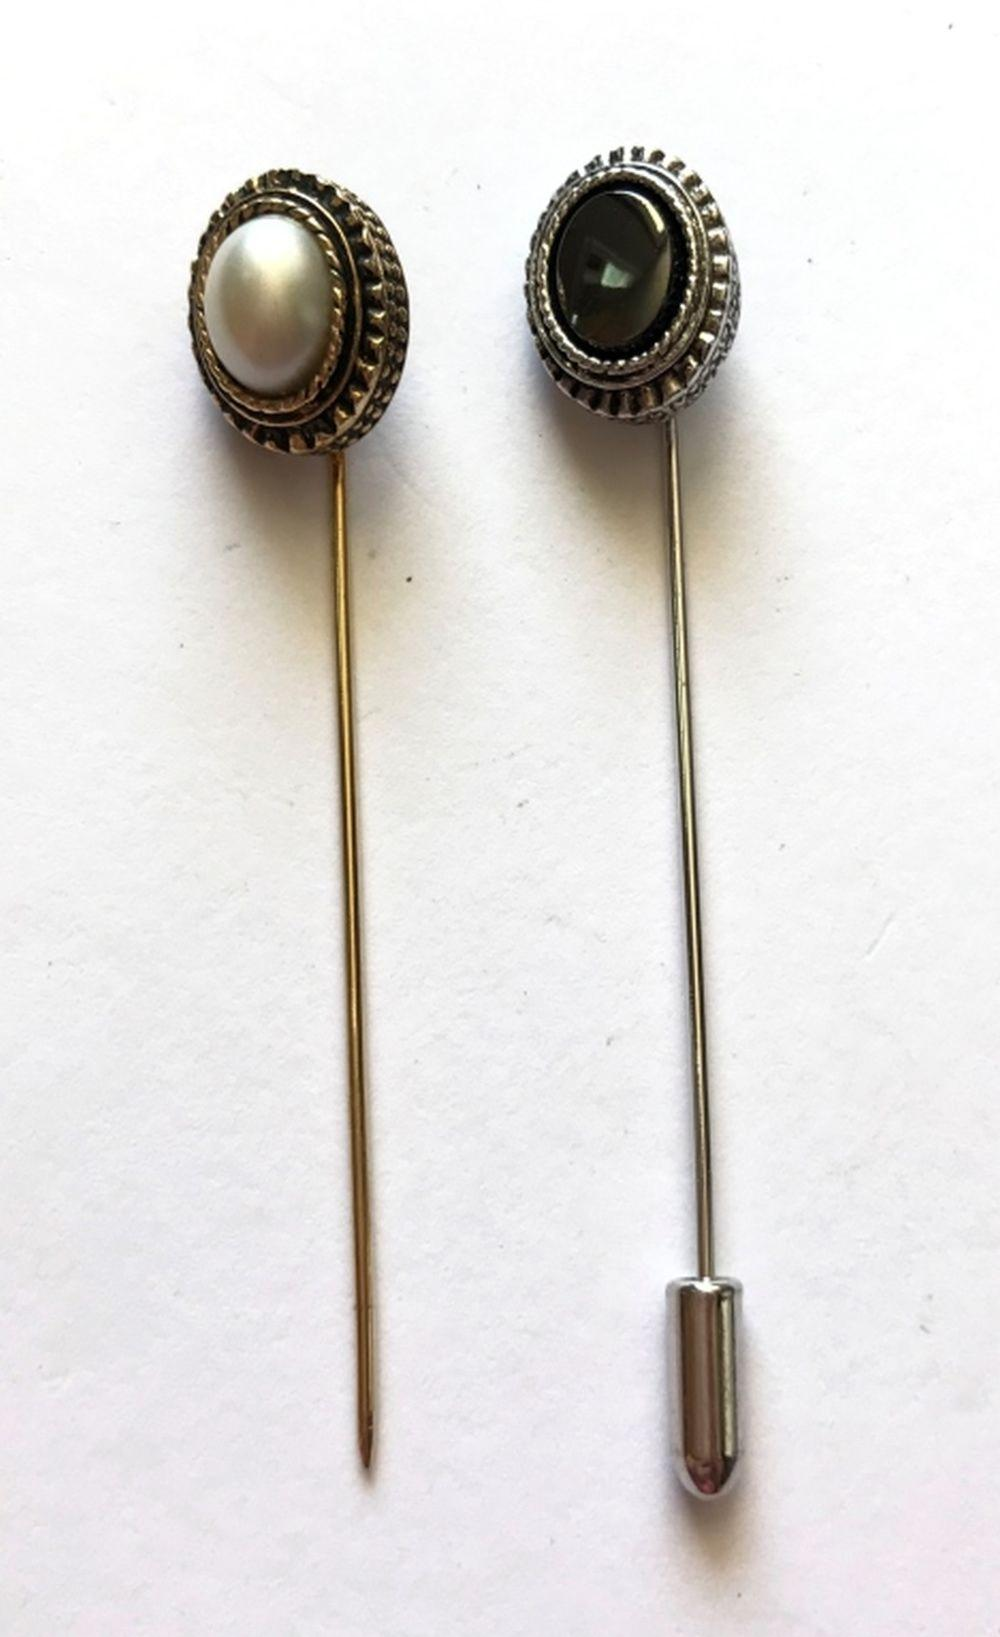 2 SARAH COVENTRY PINS